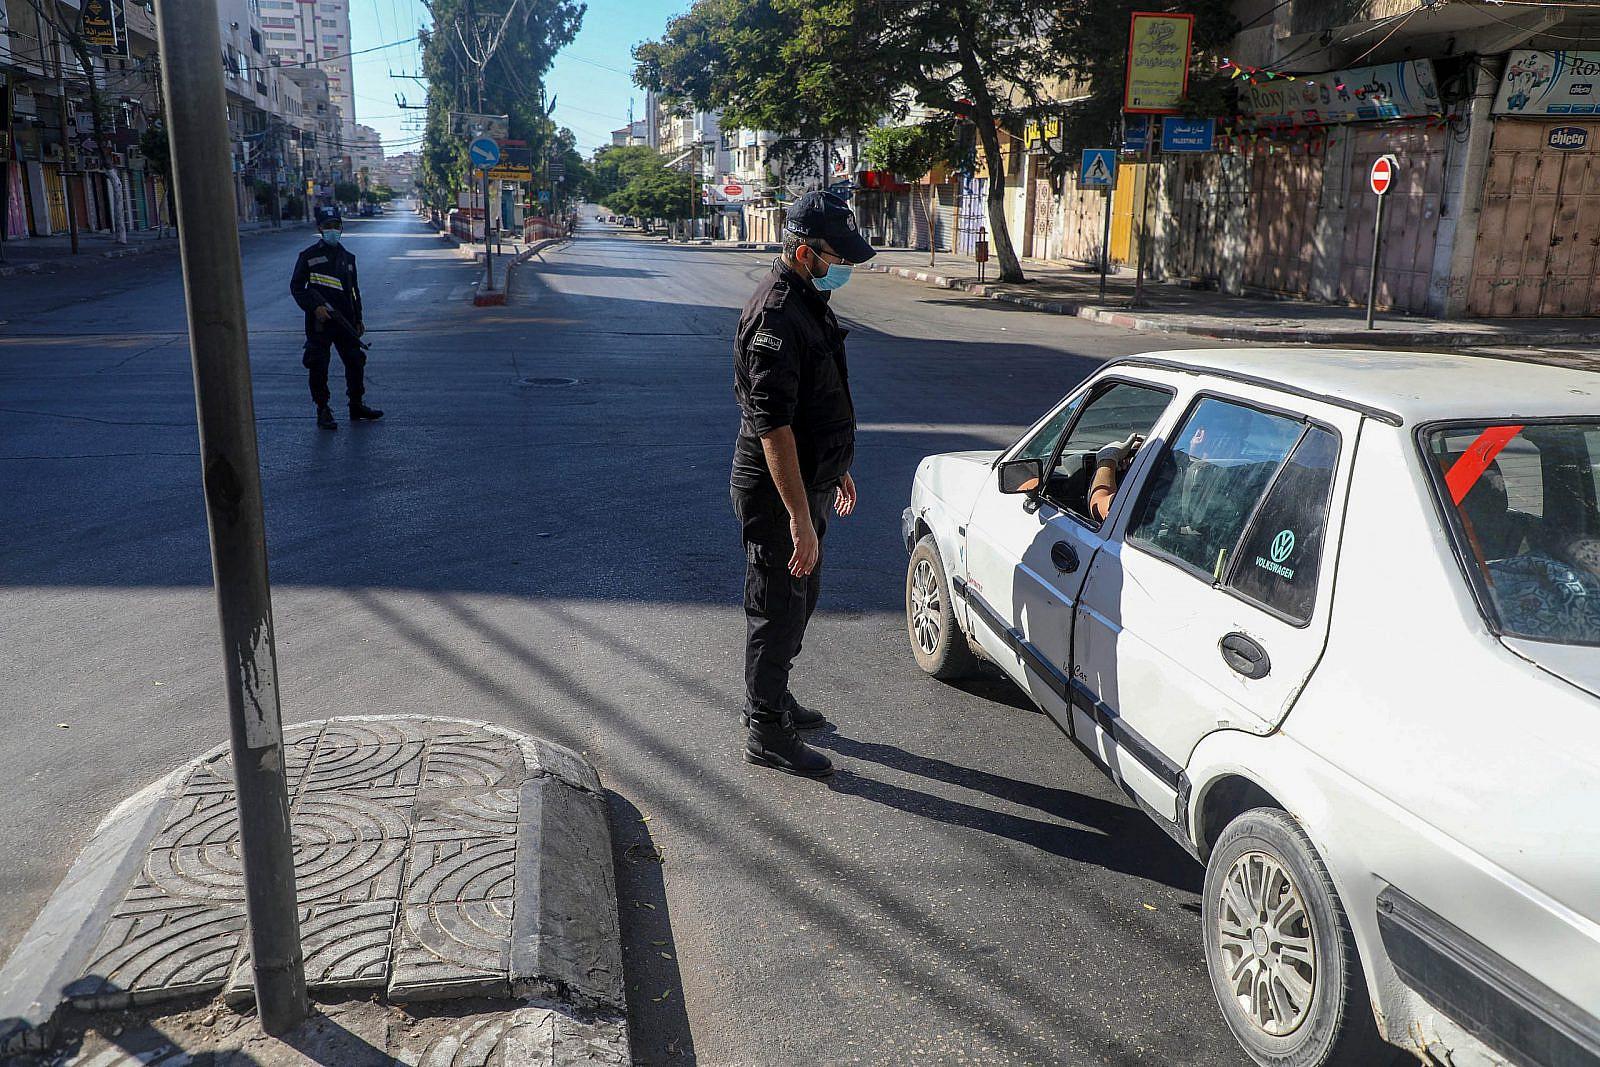 Hamas policemen enforce the lockdown on the streets in Gaza City, August 25, 2020. (Mohammed Zaanoun/Activestills)